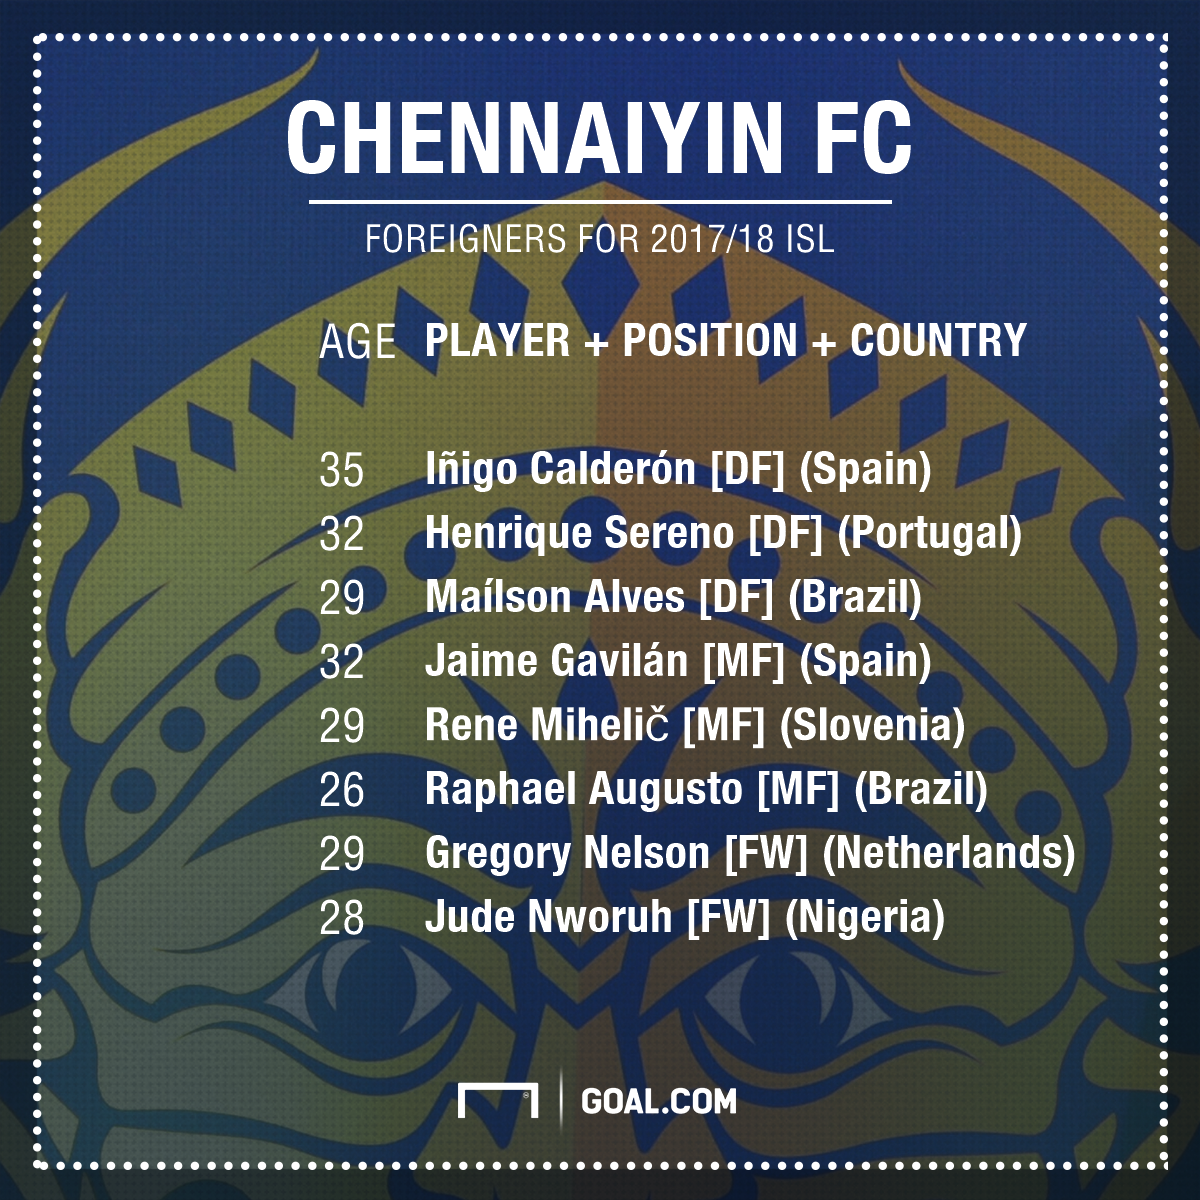 Chennaiyin foreign clan